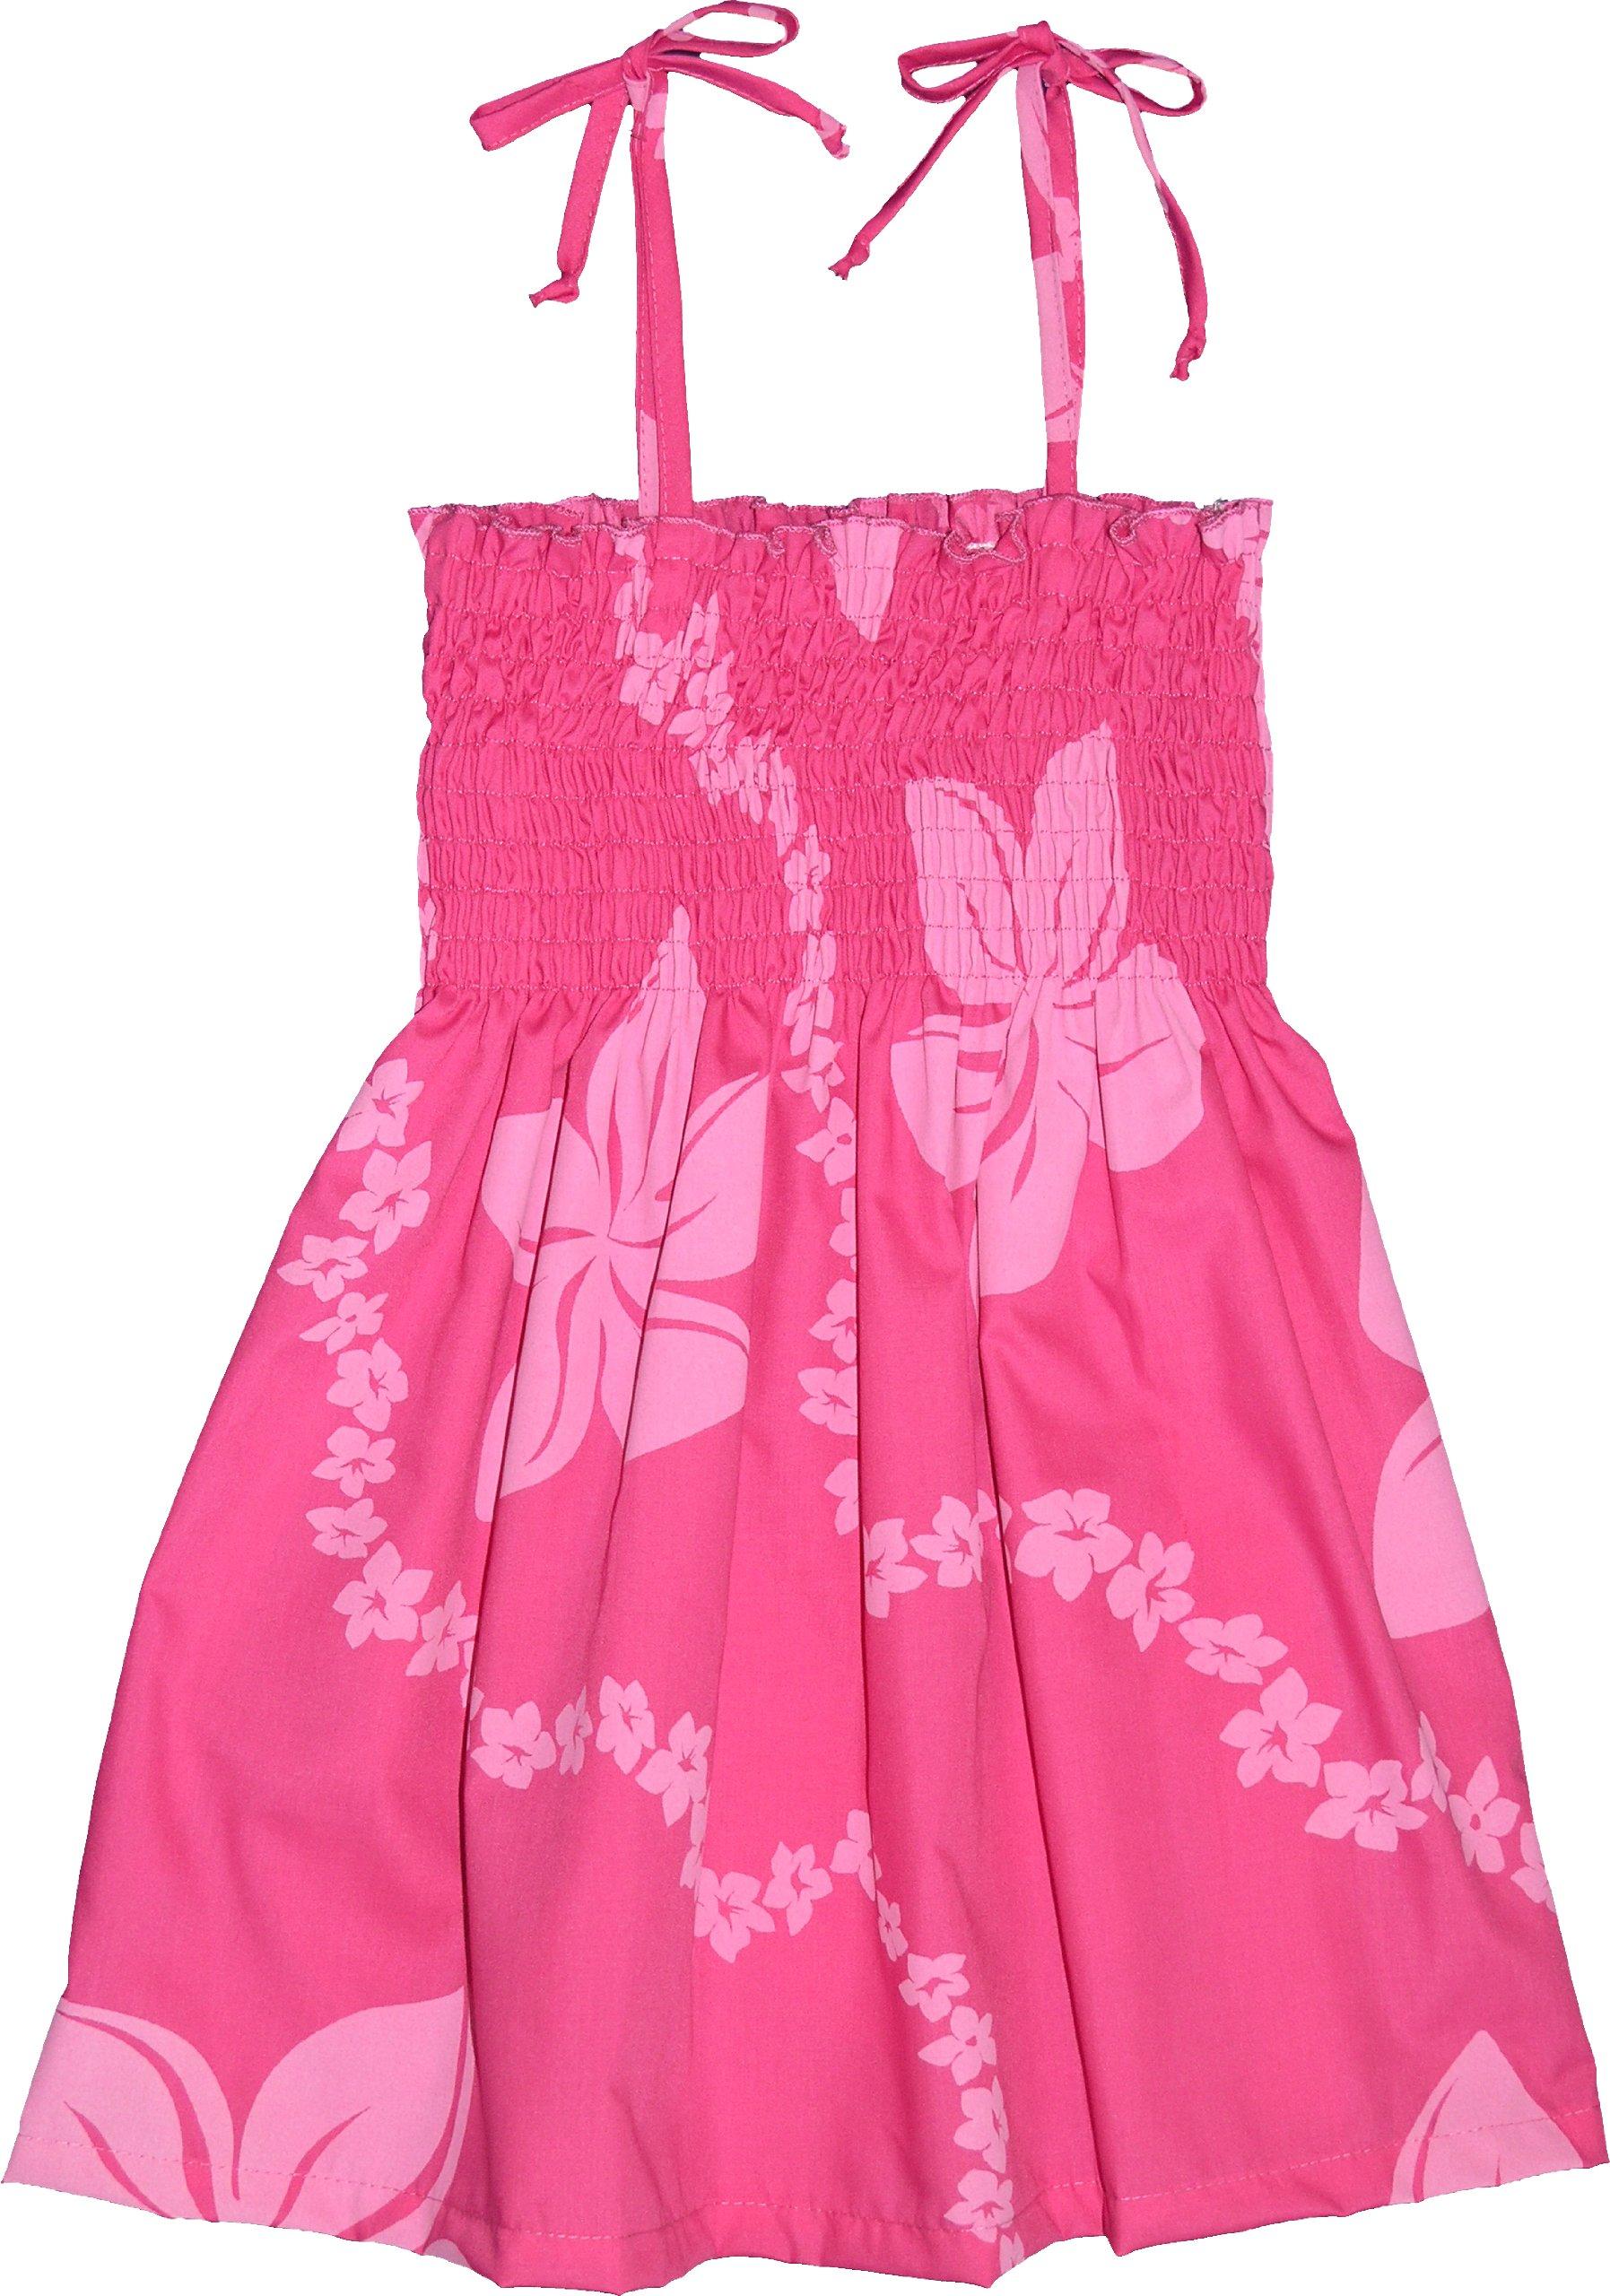 Tube Dress - Girl's Little Lei Spaghetti Strap Elastic Tube Top Hawaiian Aloha Polyester Cotton Smocked Sundress in Pink - 6